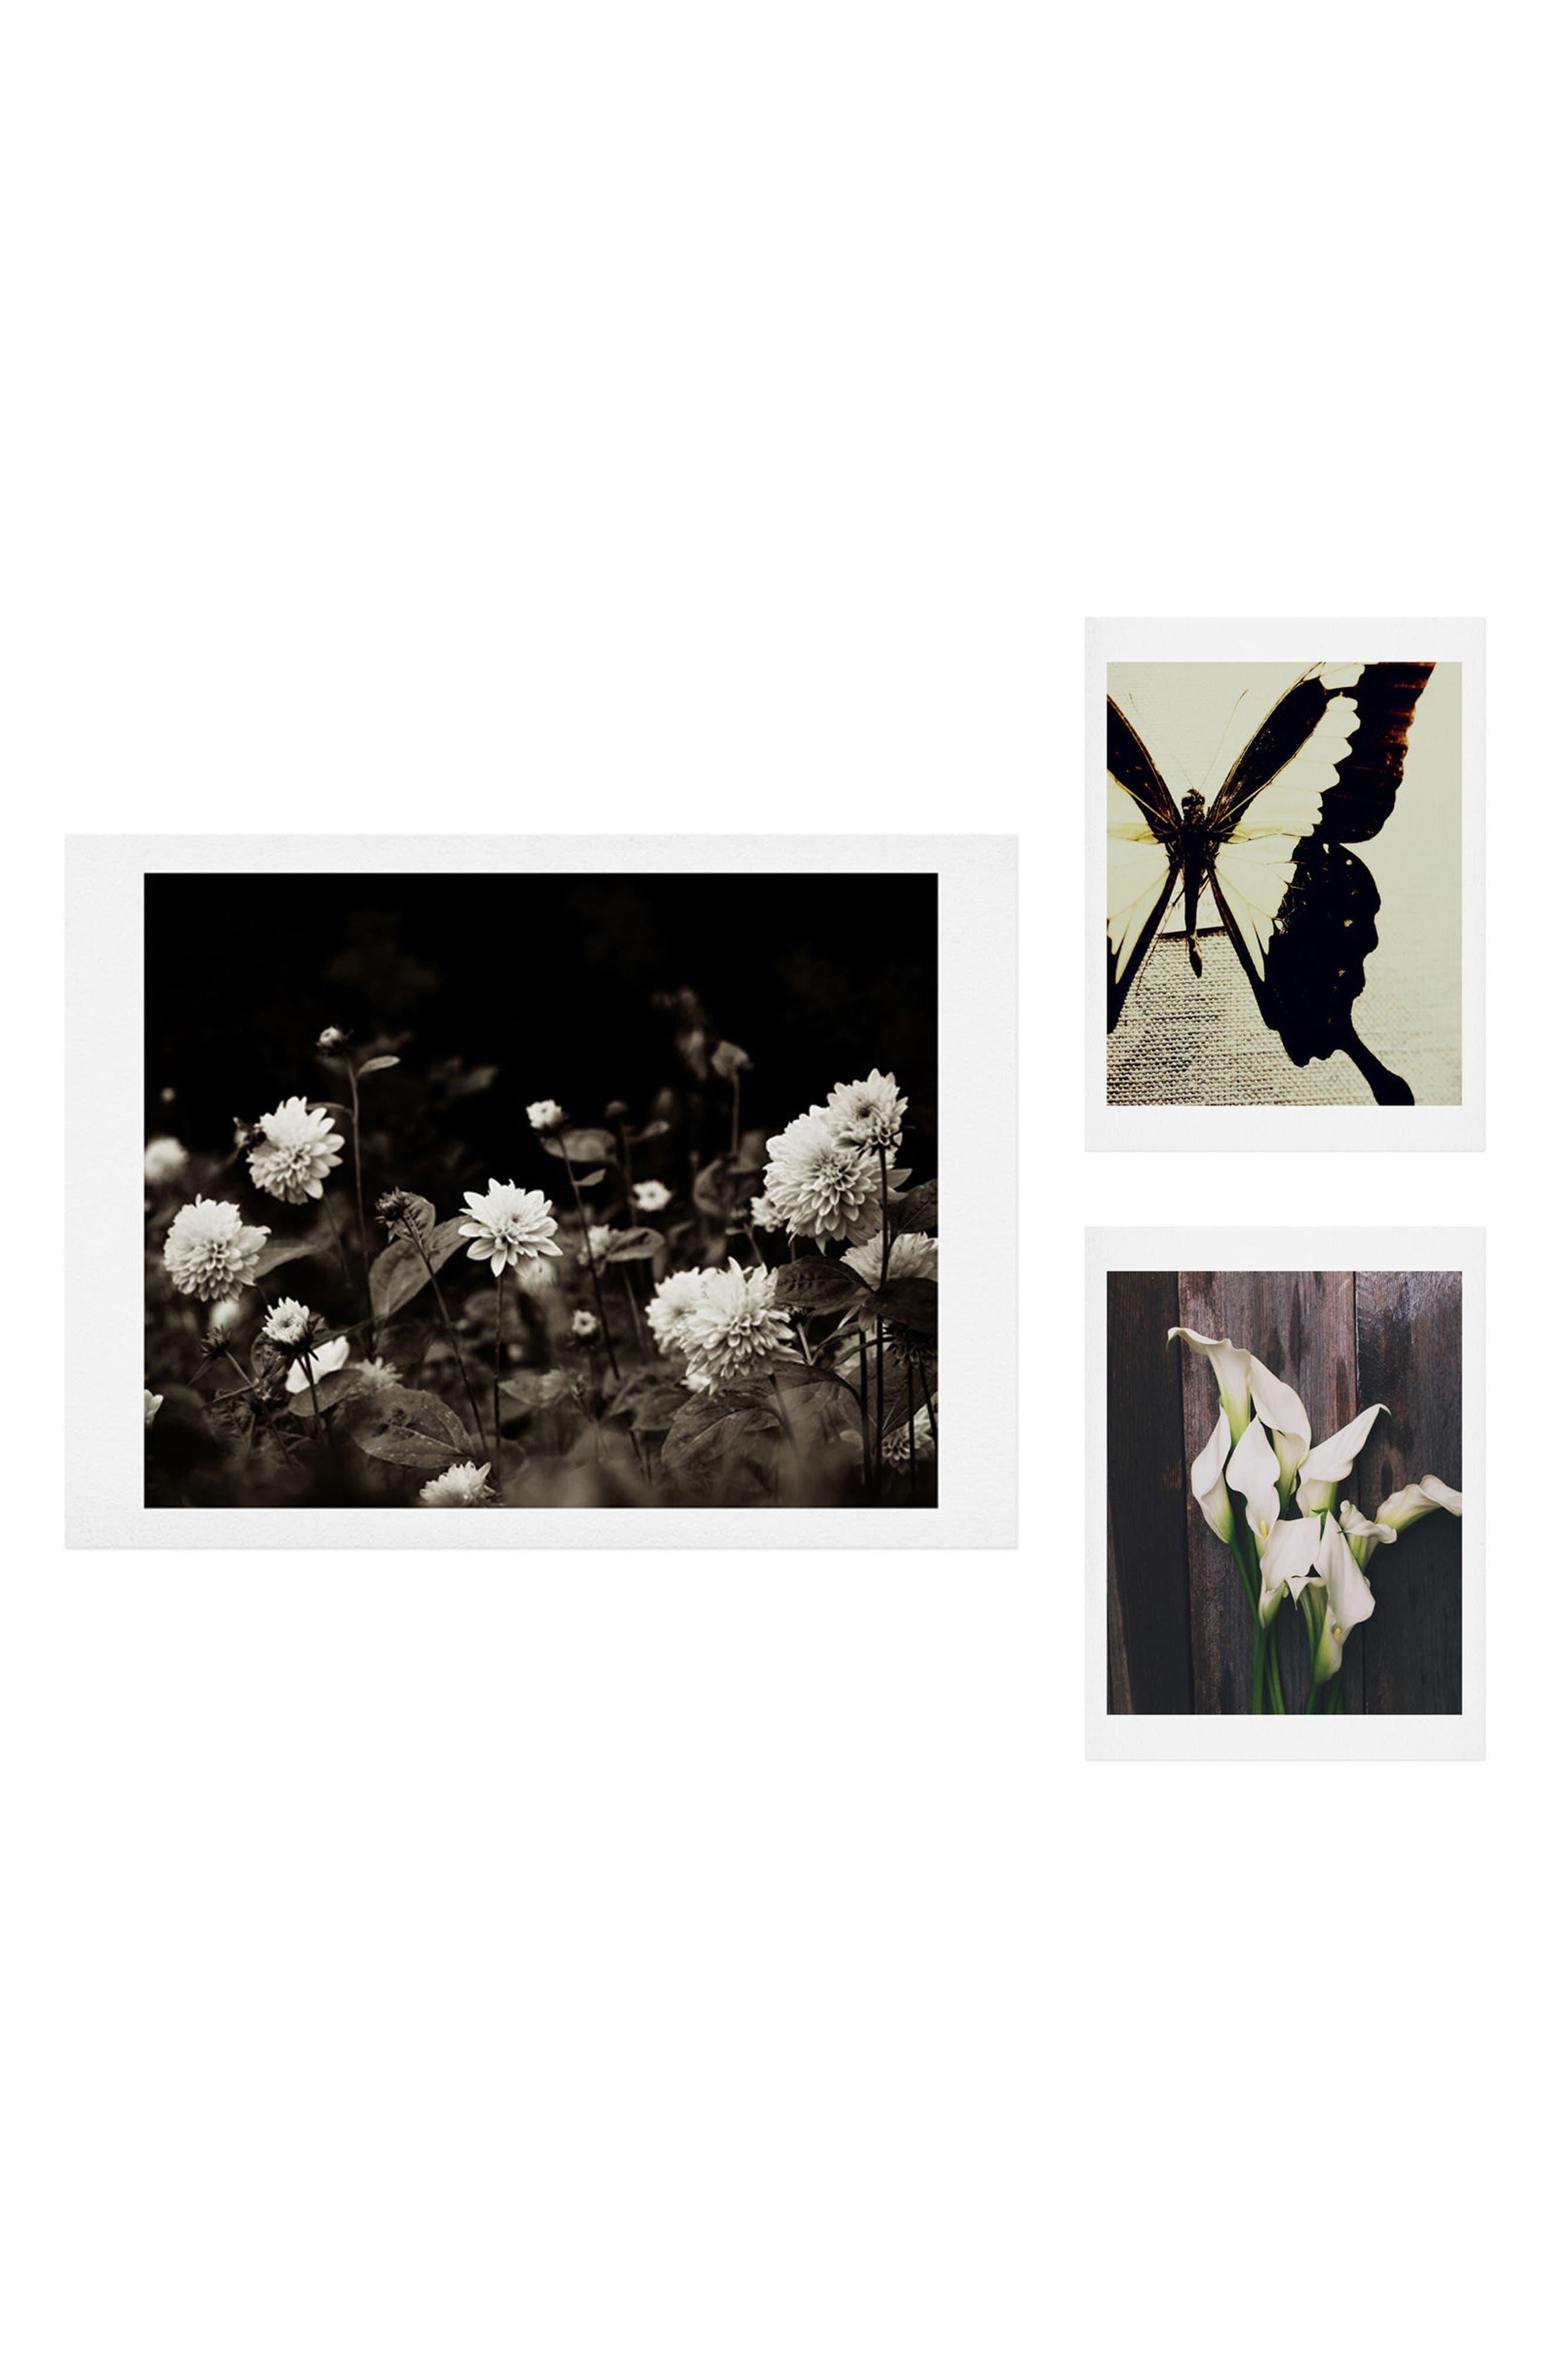 Black Dahlia 3-Piece Gallery Wall Art Print Set,                             Main thumbnail 1, color,                             Black/ White